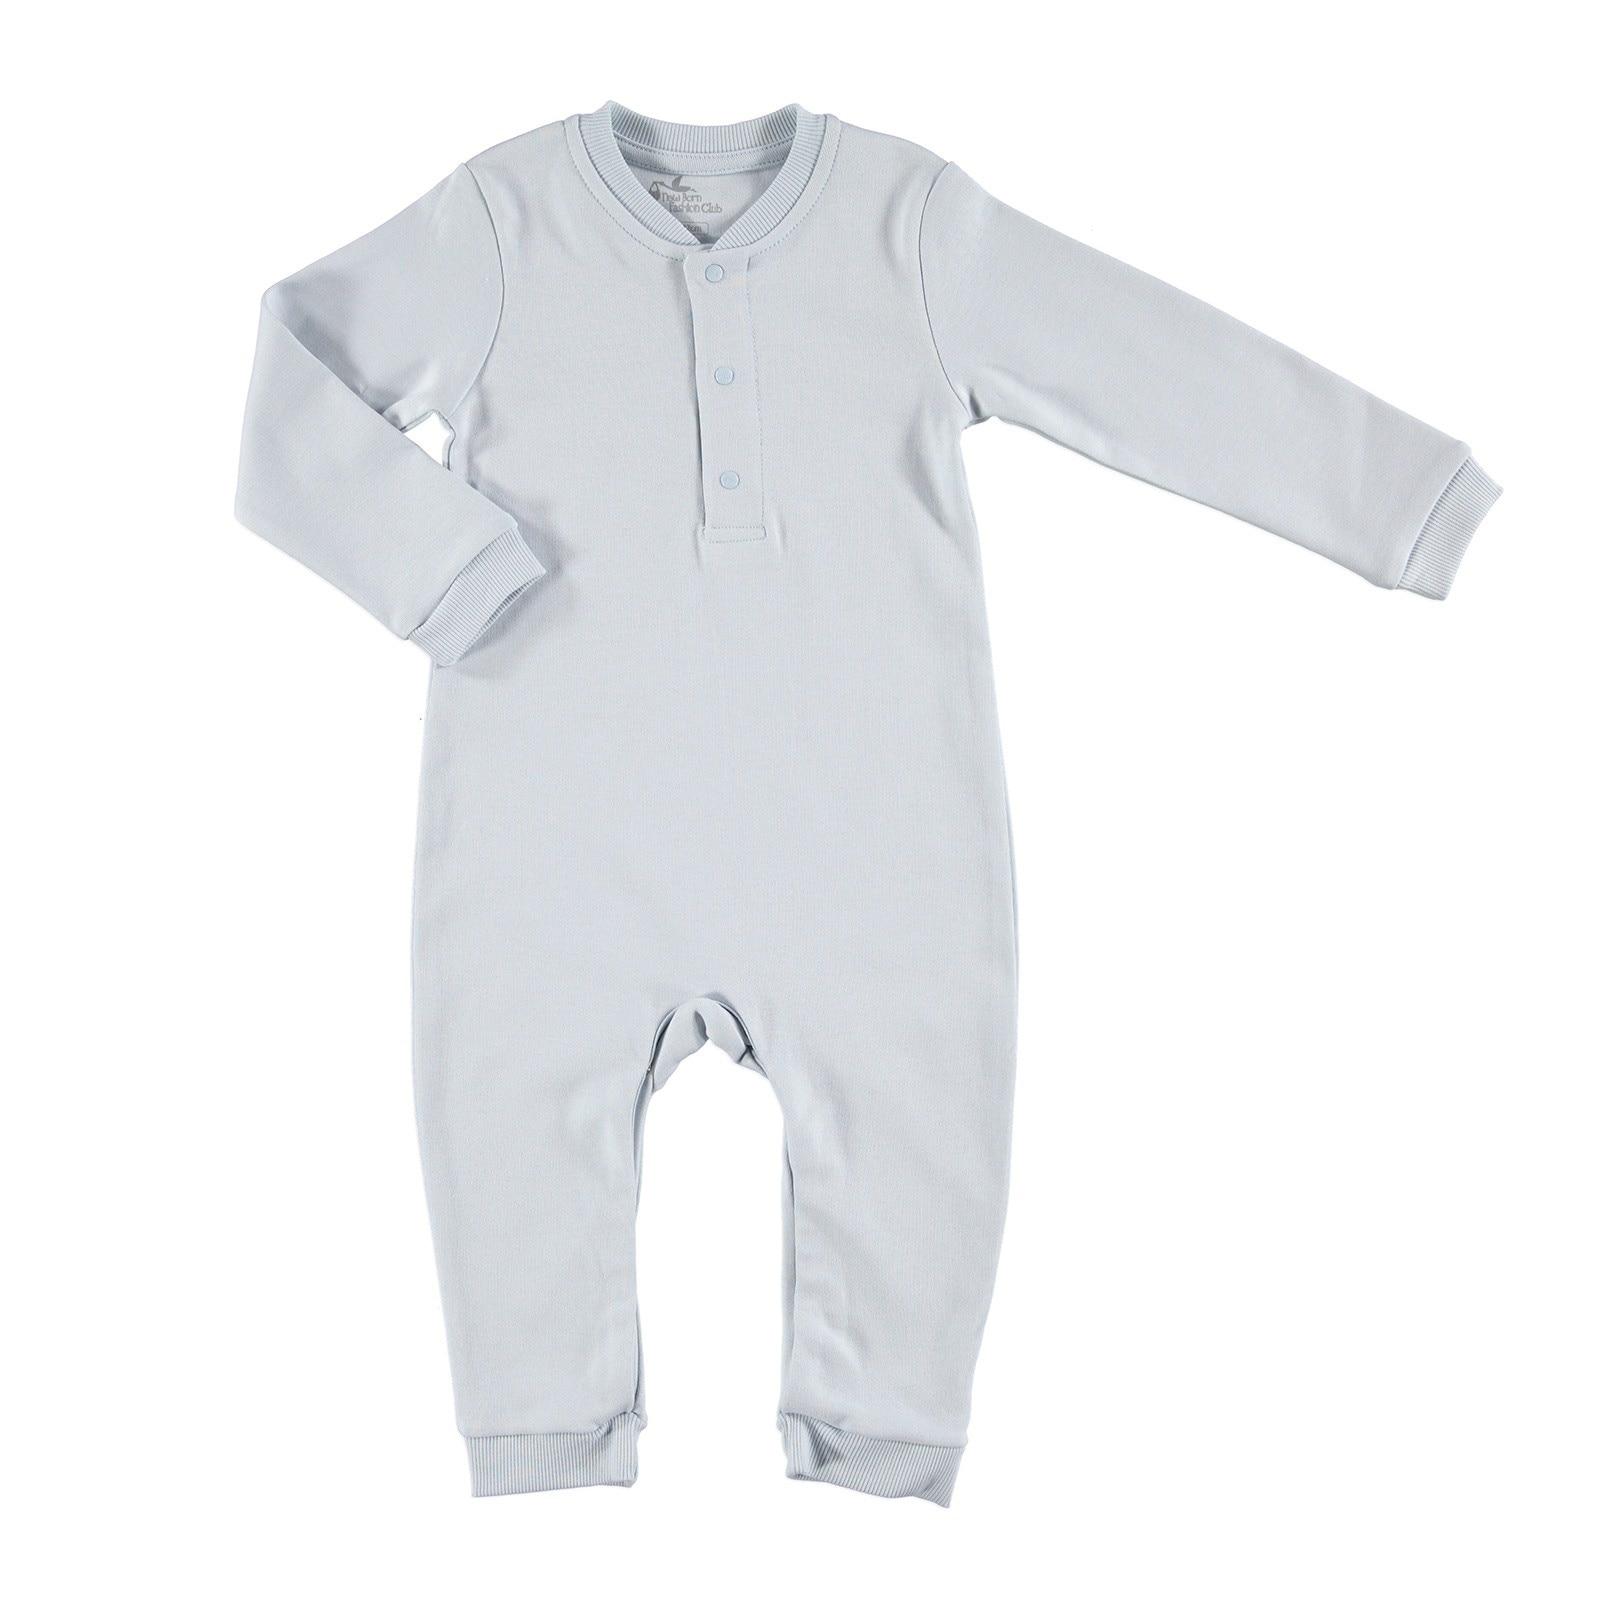 Ebebek Newborn Fashion Club Fun Winter Baby Snaps Romper